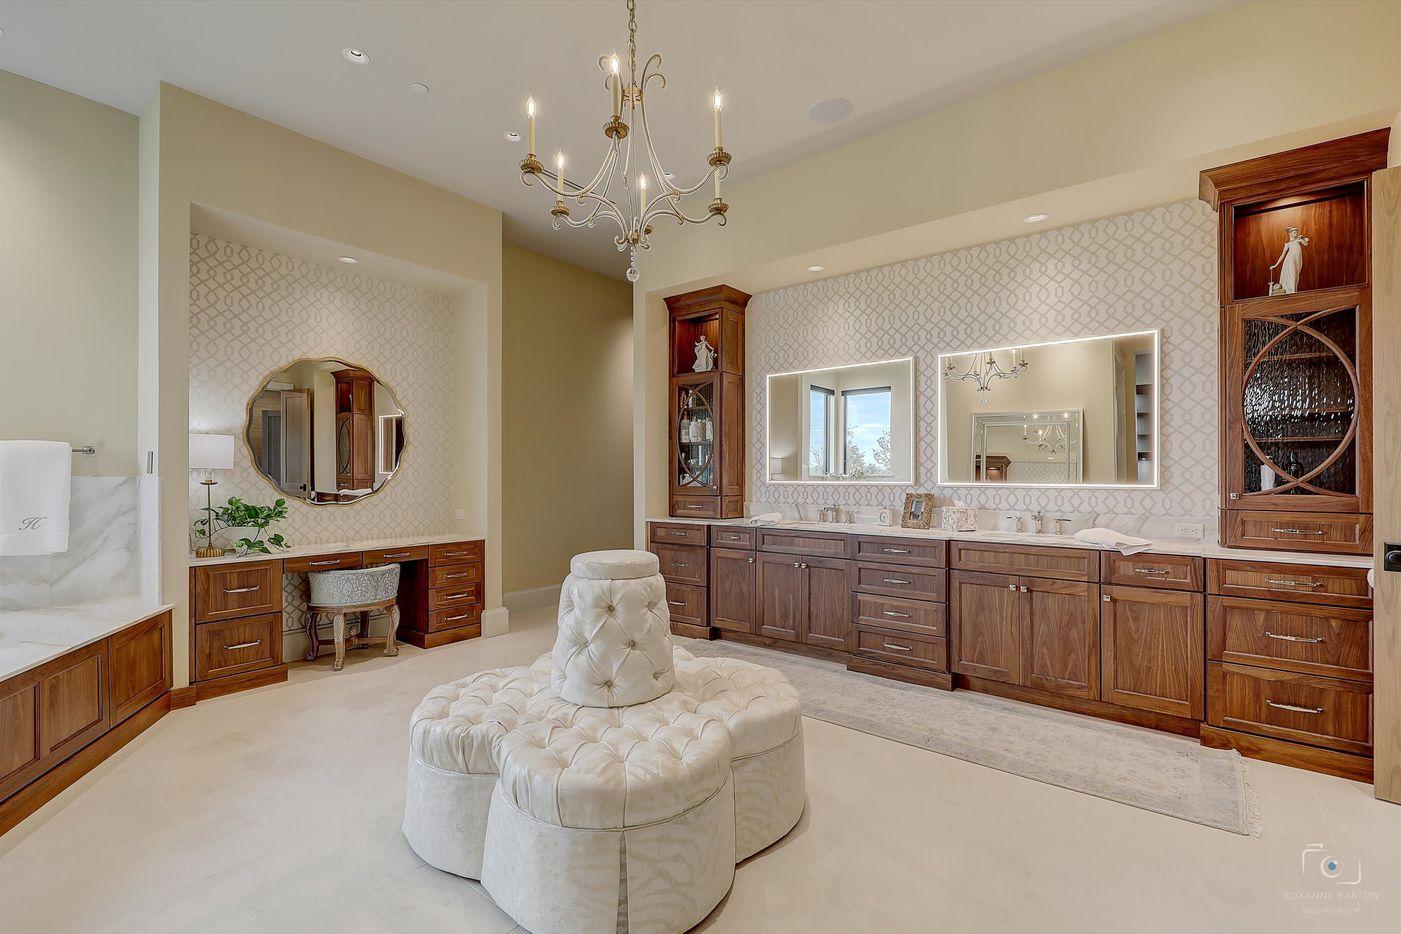 Take a look at the home at 245 E. Bob Jones Road in Southlake.